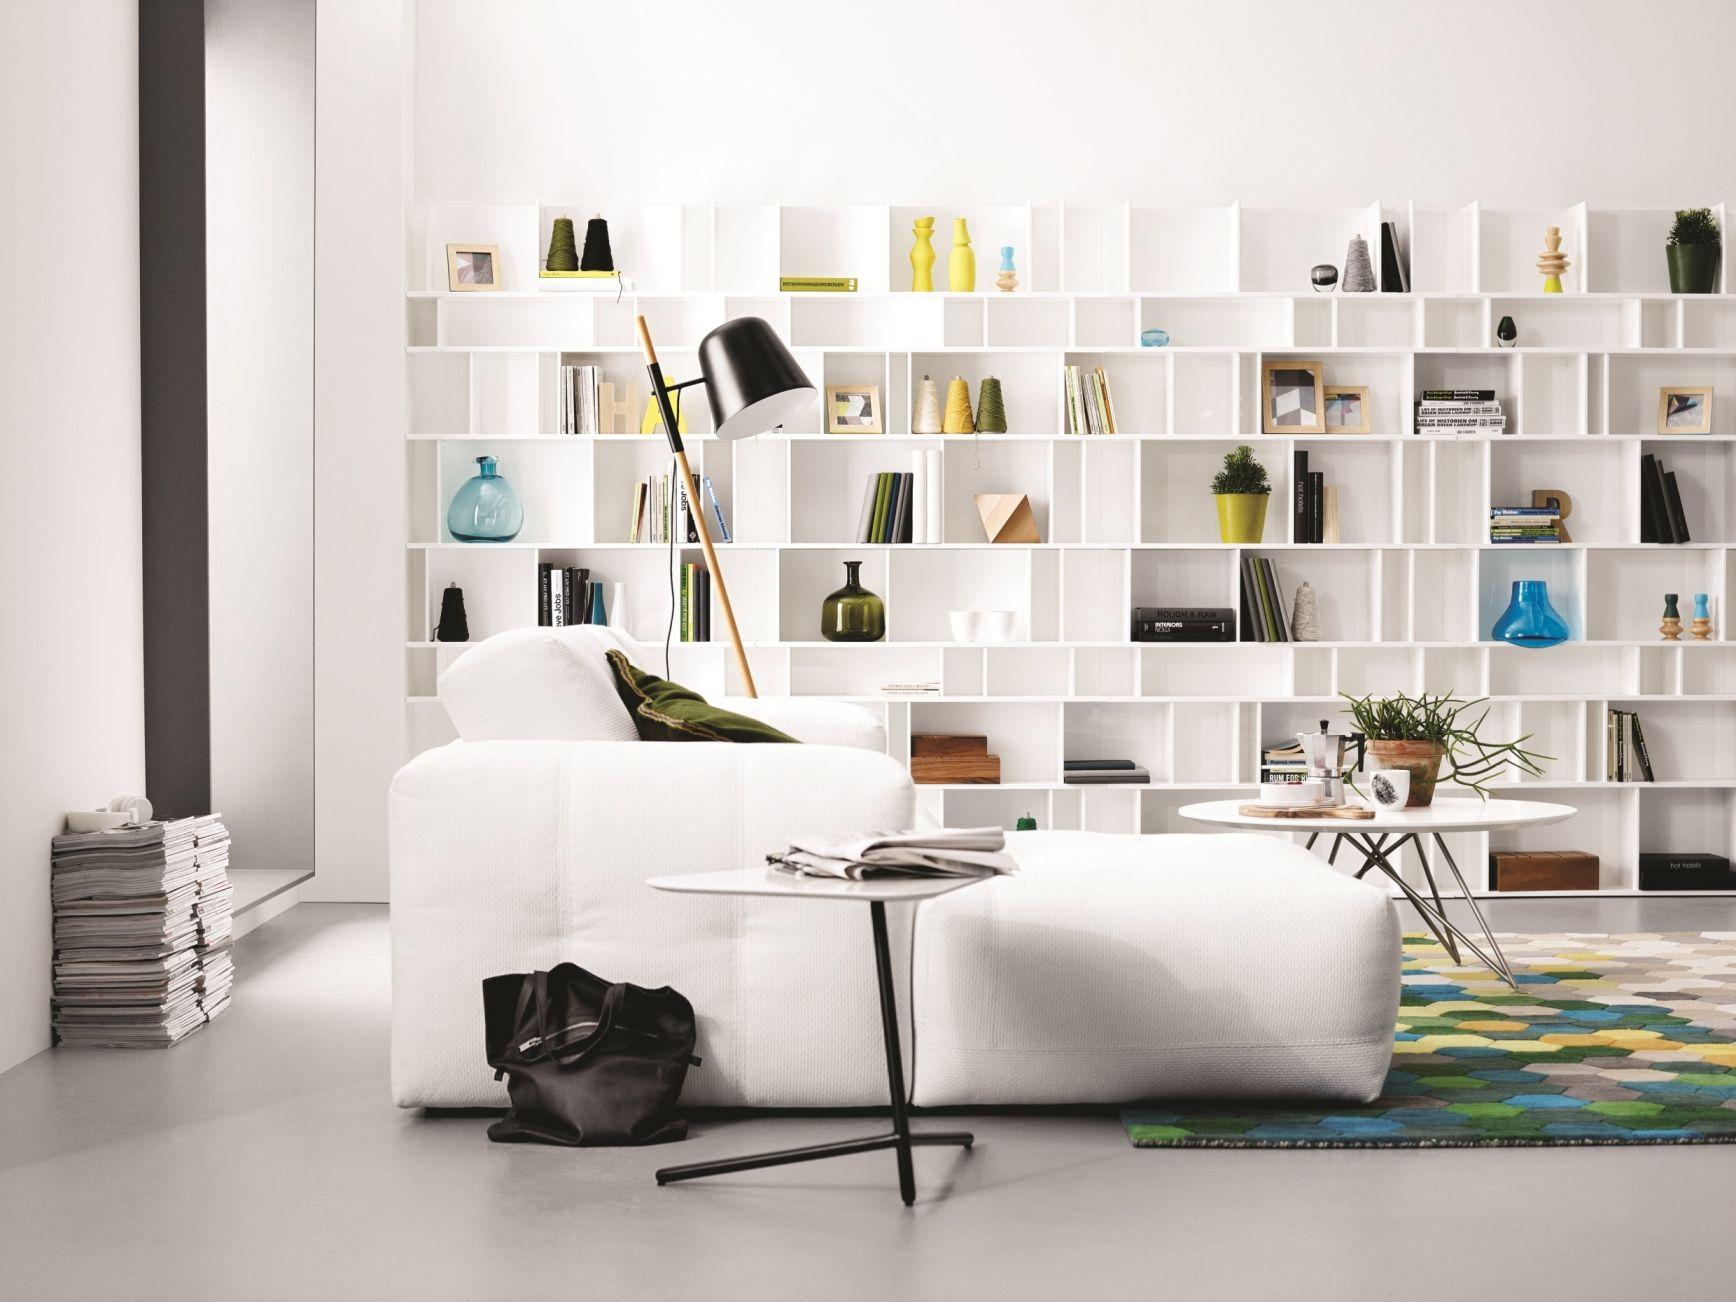 Celebrating 60 Years Of Danish Design StyleLiving Room WallsLiving